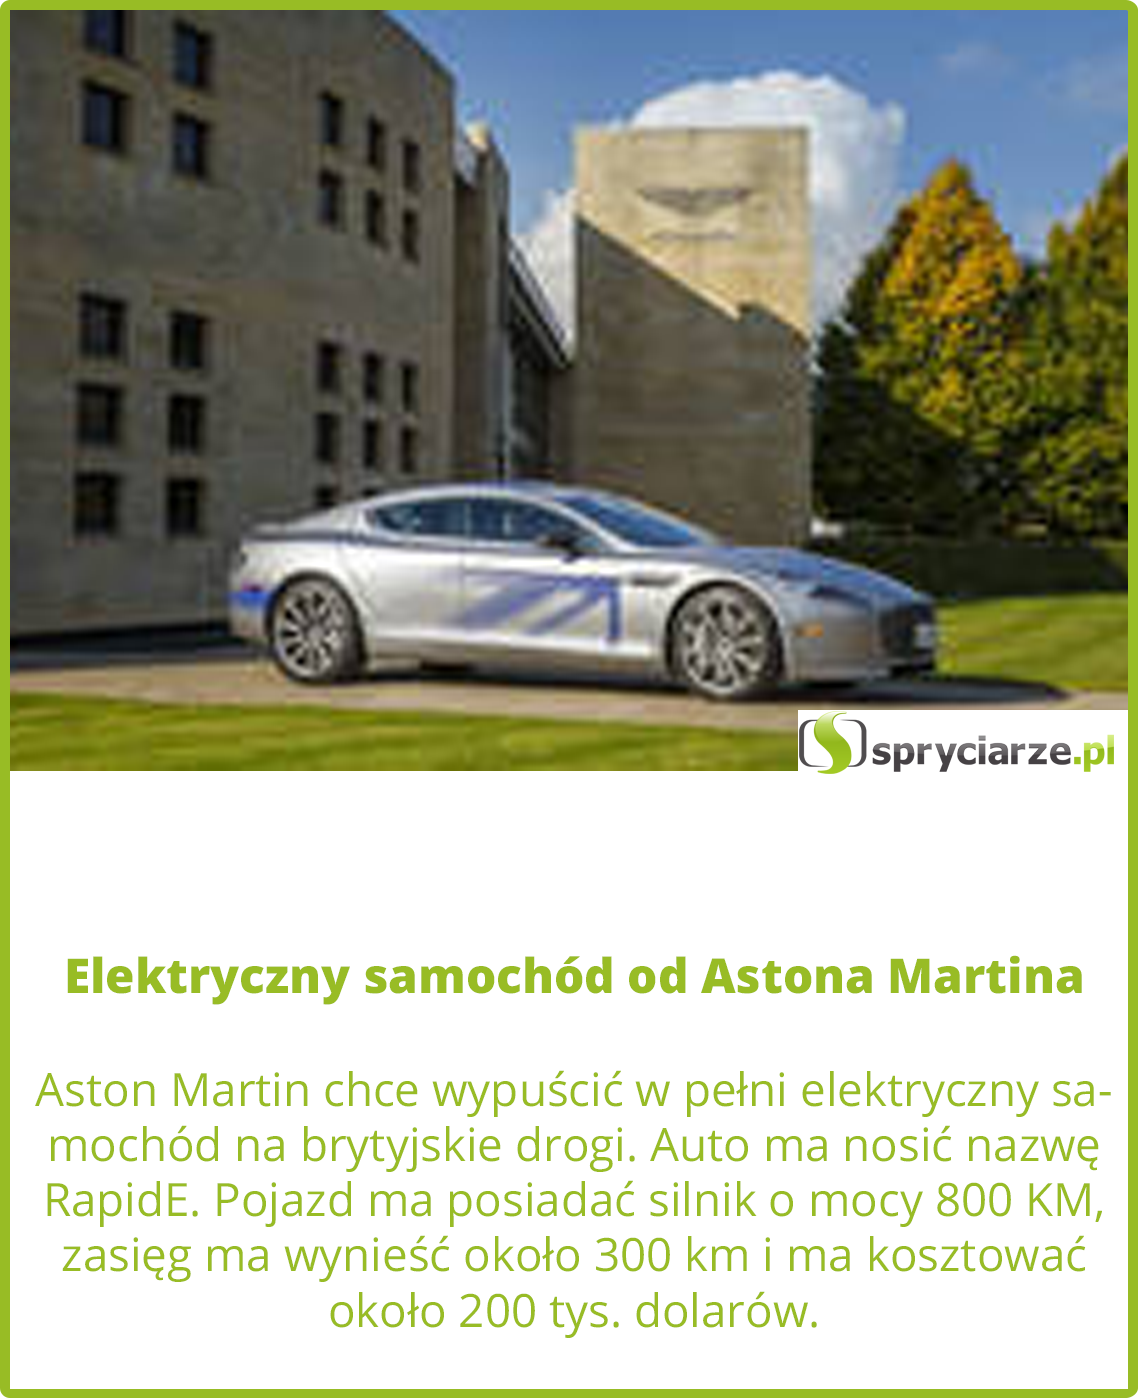 Elektryczny samochód od Astona Martina